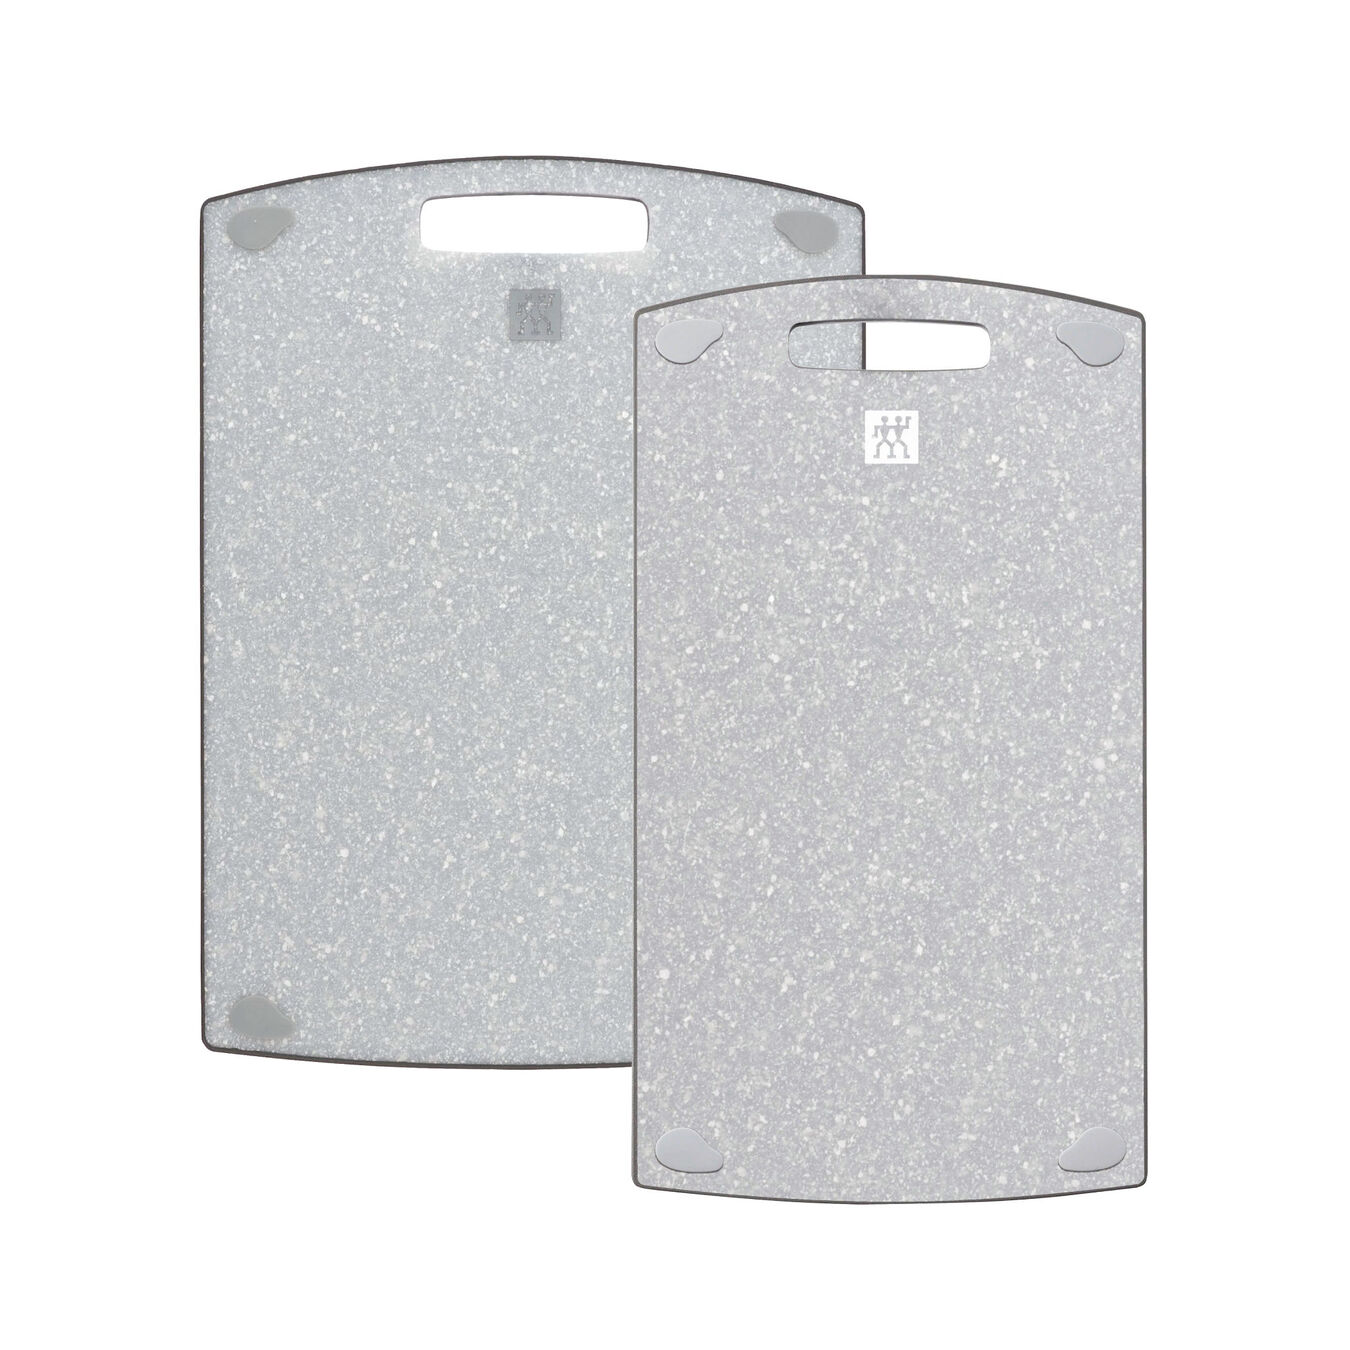 2 pc. Cutting board set, Plastic | 36 cm x 20 cm & 37 cm x 27 cm 36 cm x 20 cm,,large 3